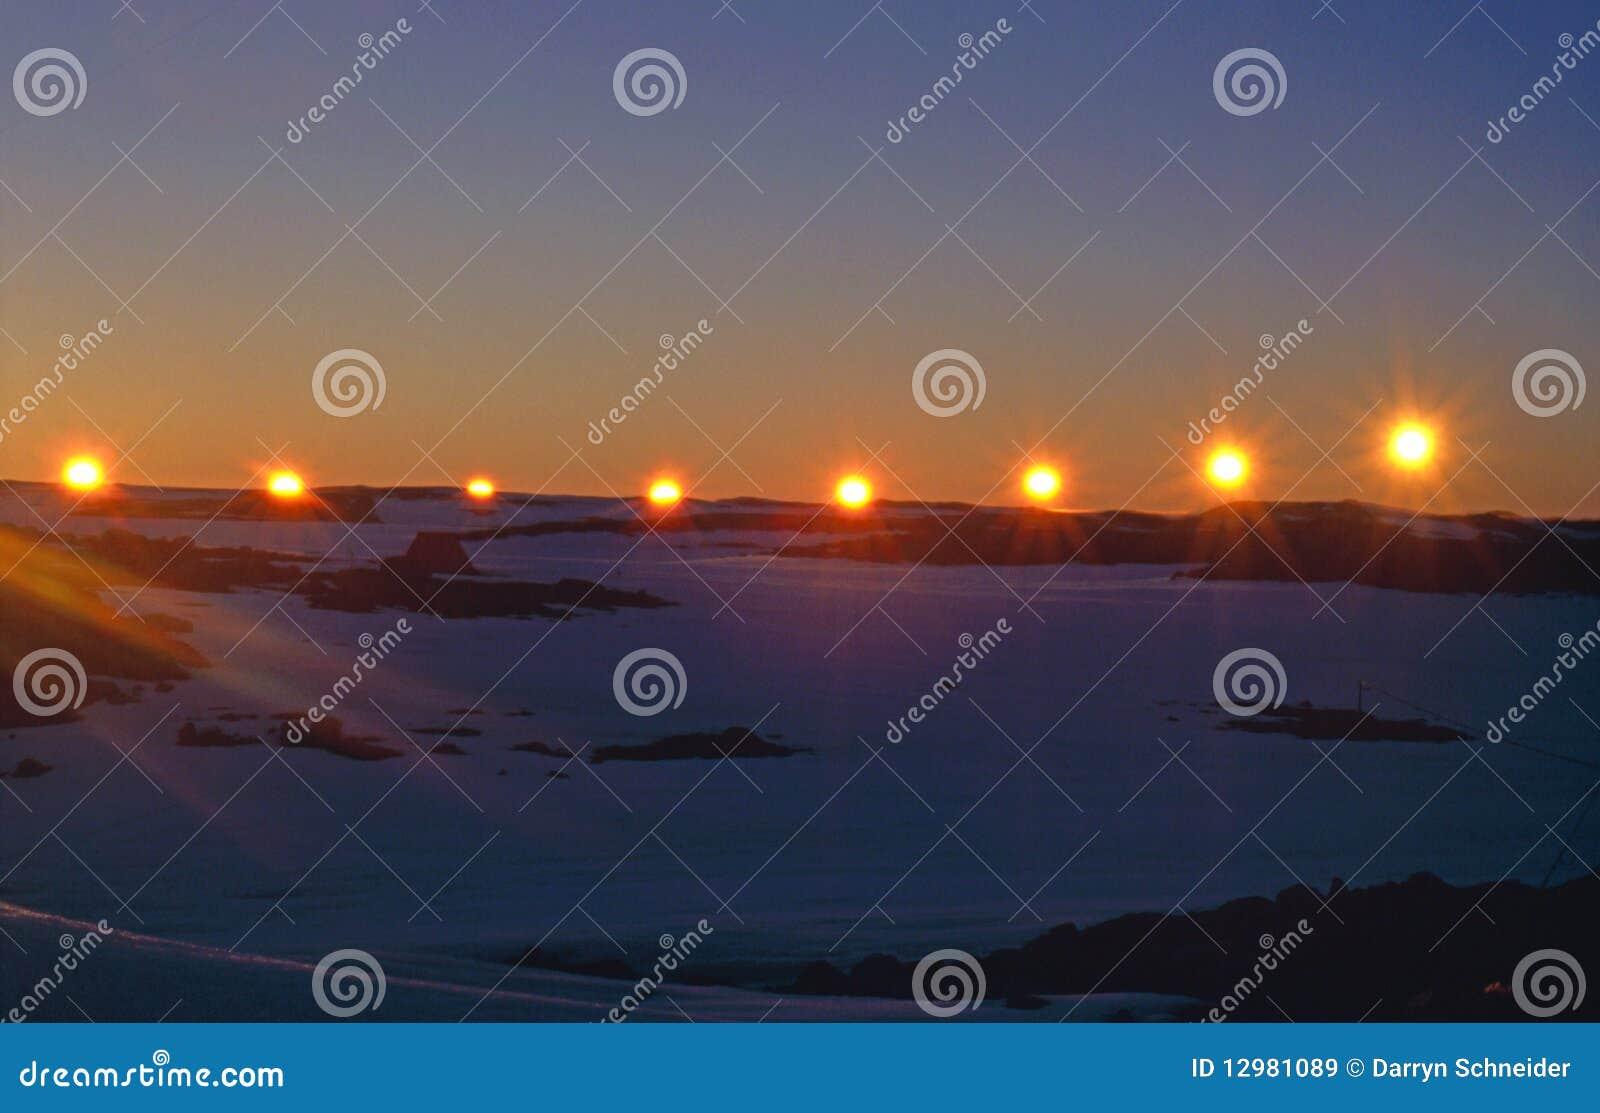 Summer Solstice Sunset at the Antarctic Circle